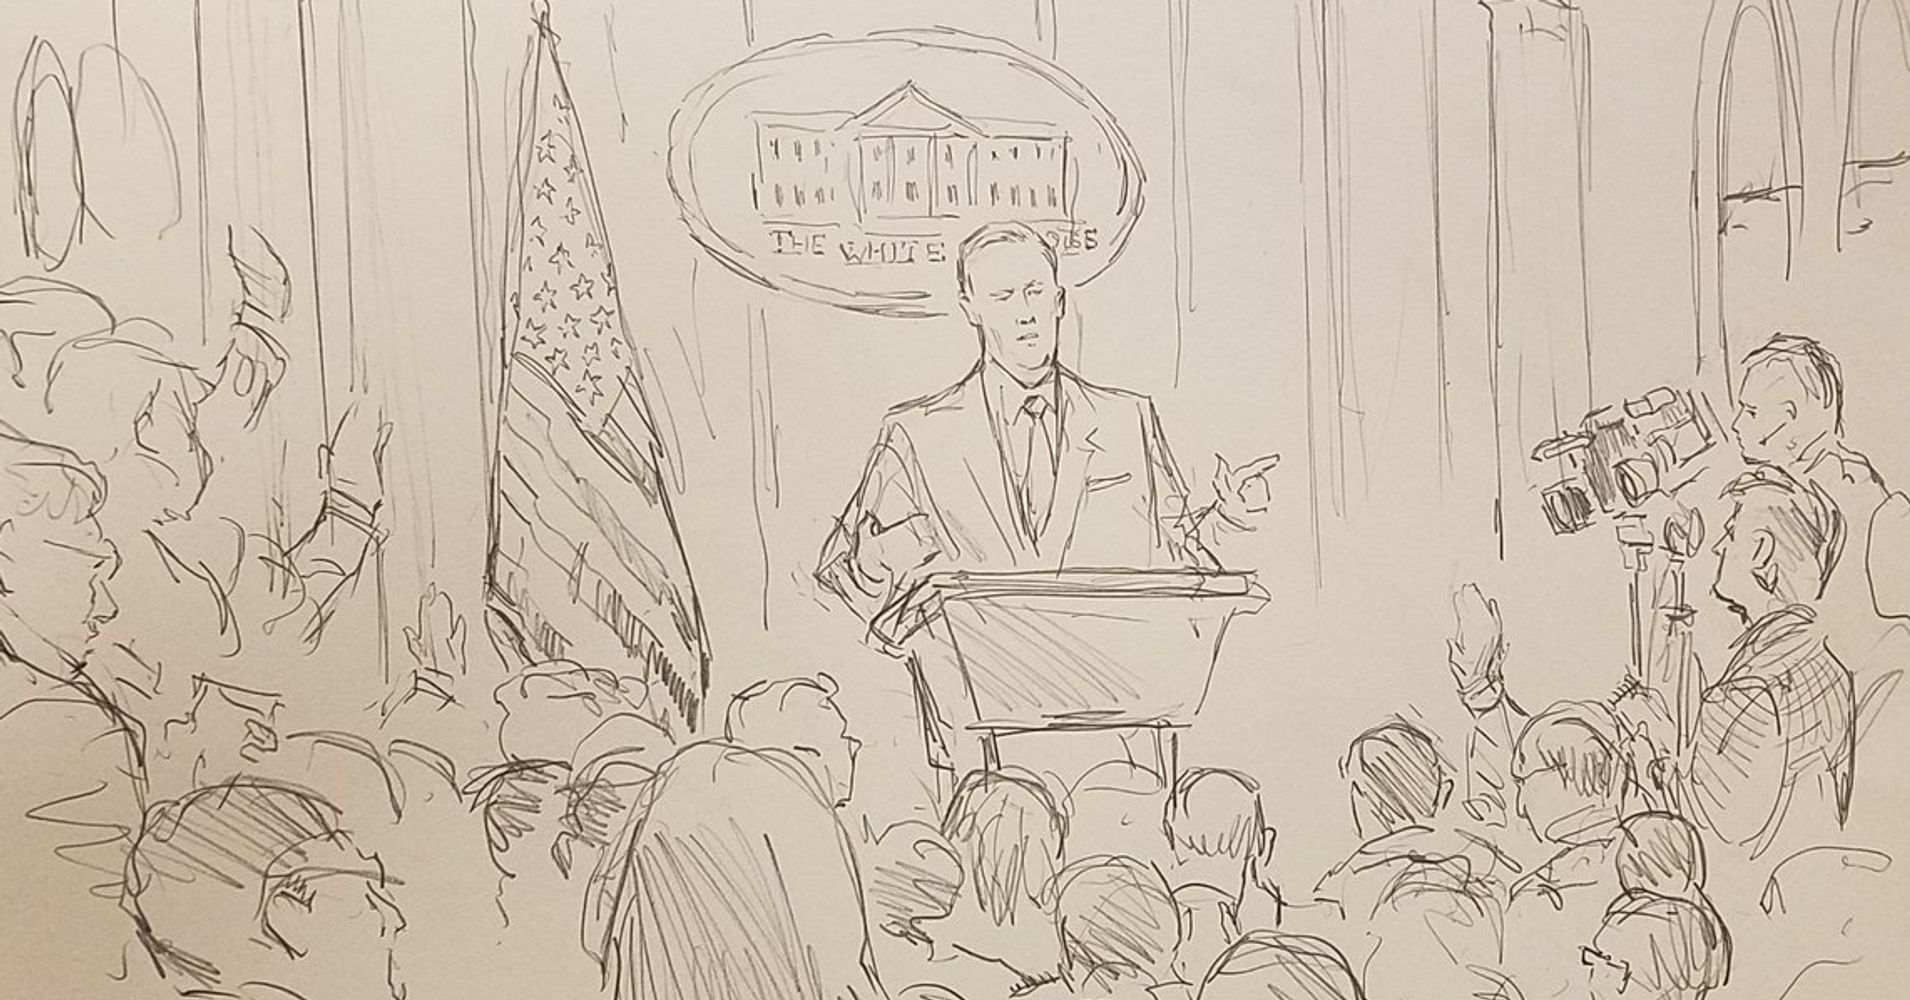 CNN Trolls The White House By Sending Sketch Artist To Press Briefing